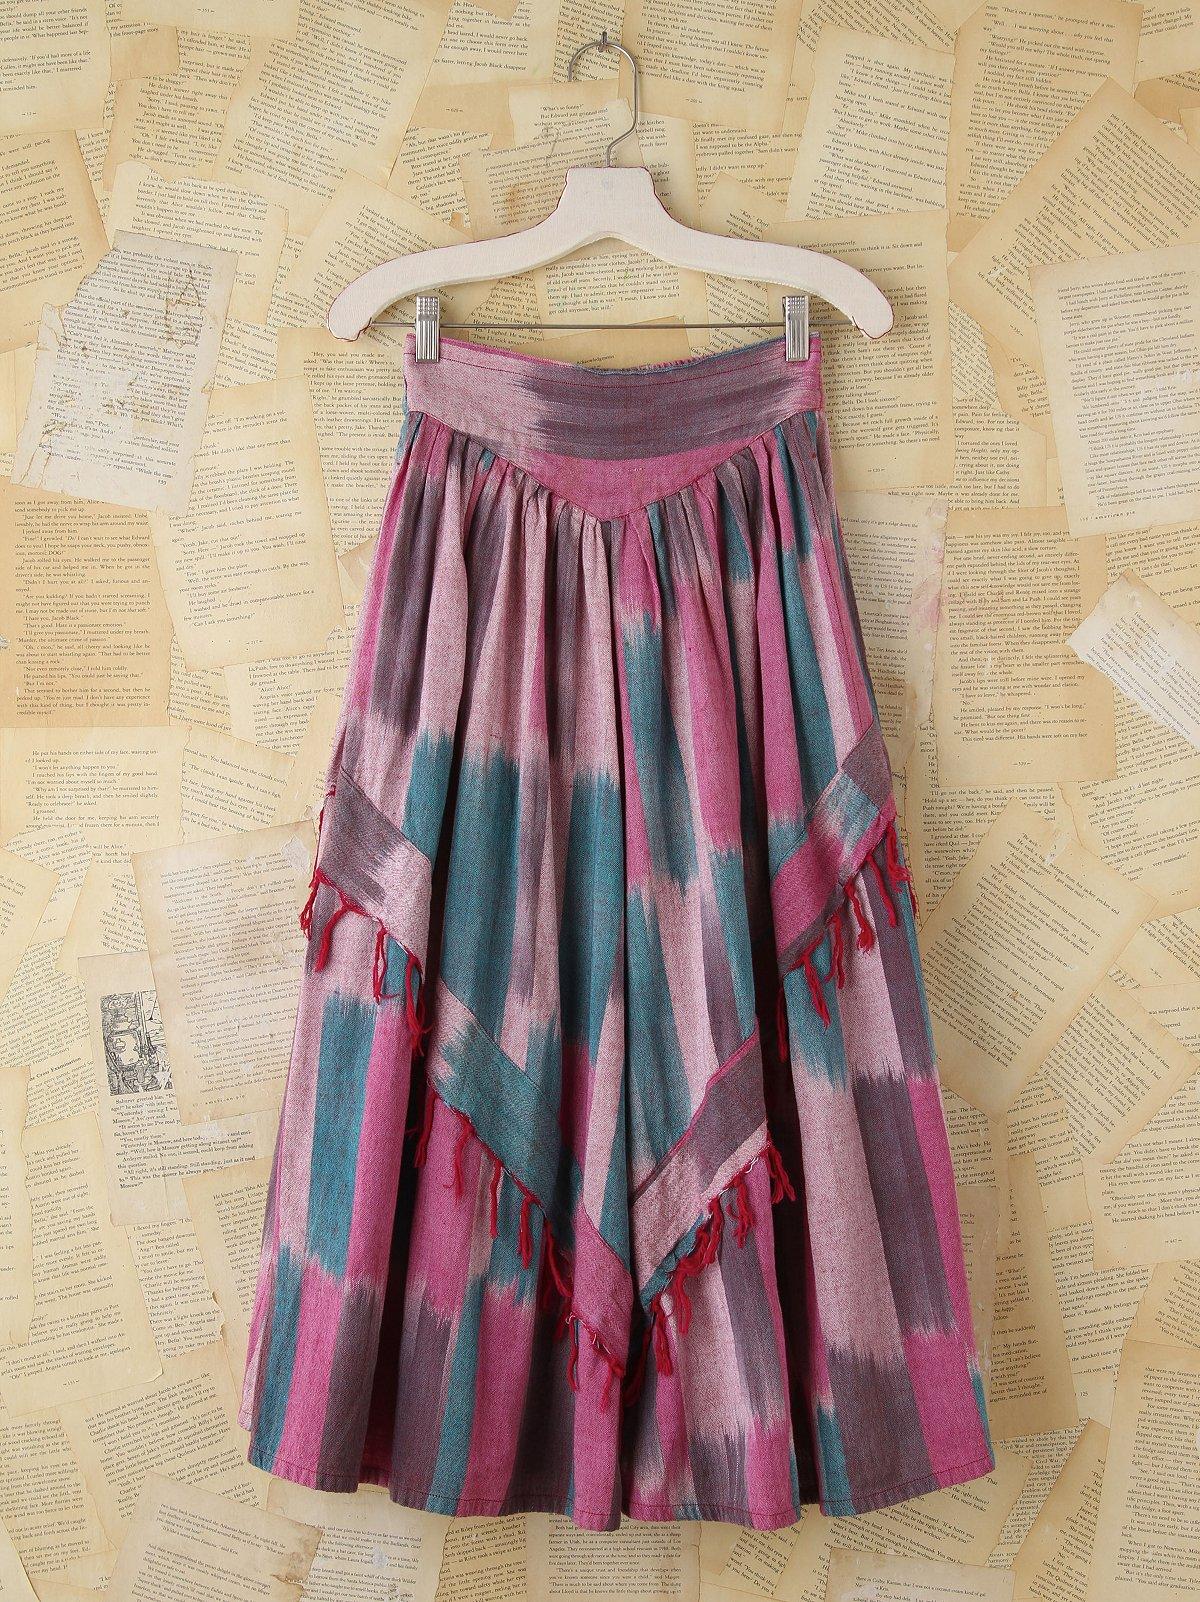 Vintage Patterned Woven Skirt